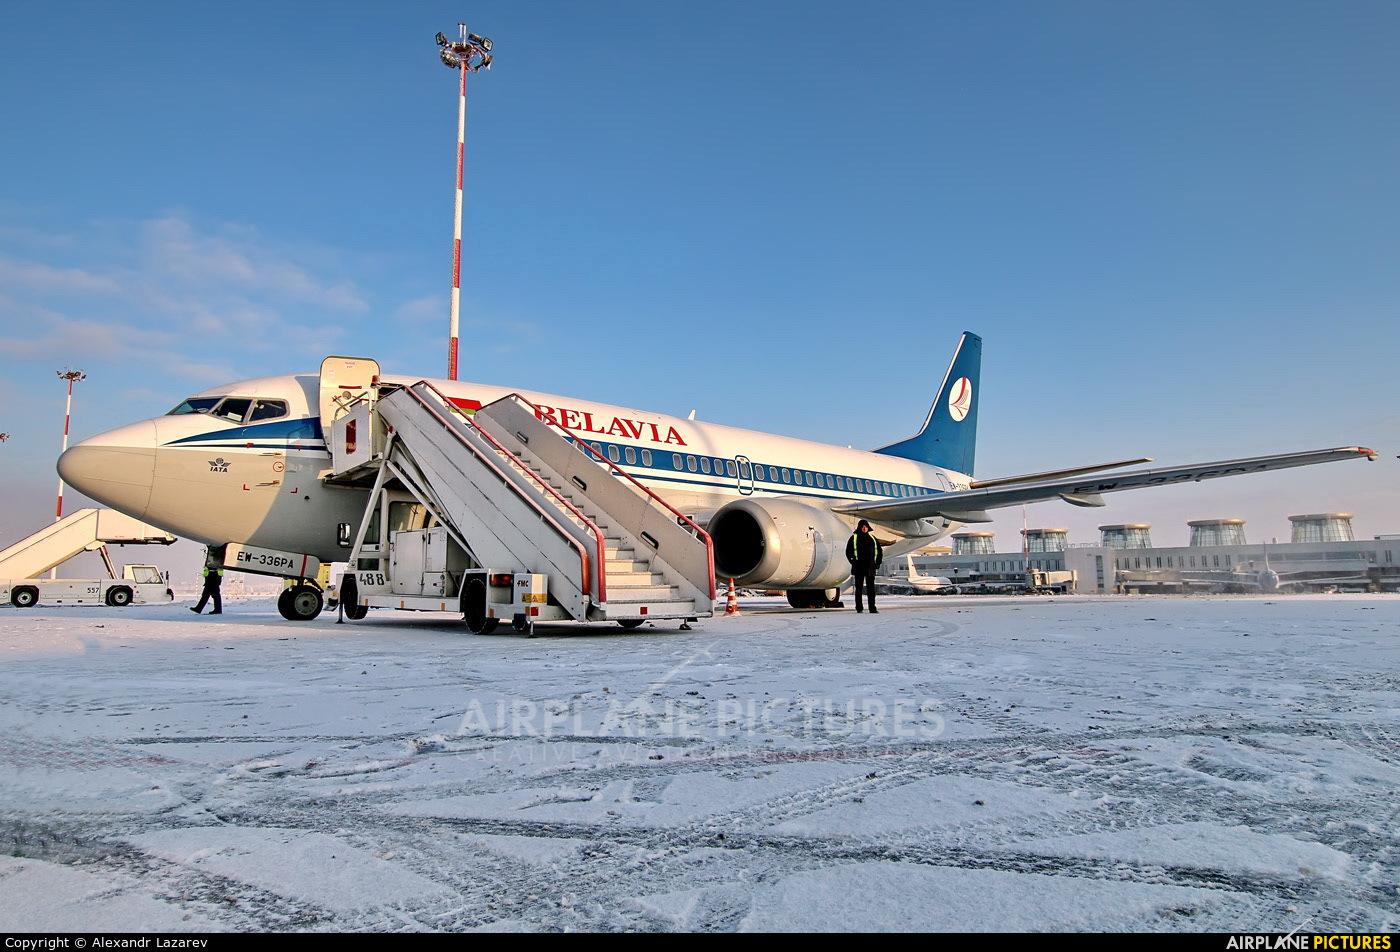 Belavia EW-336PA aircraft at St. Petersburg - Pulkovo